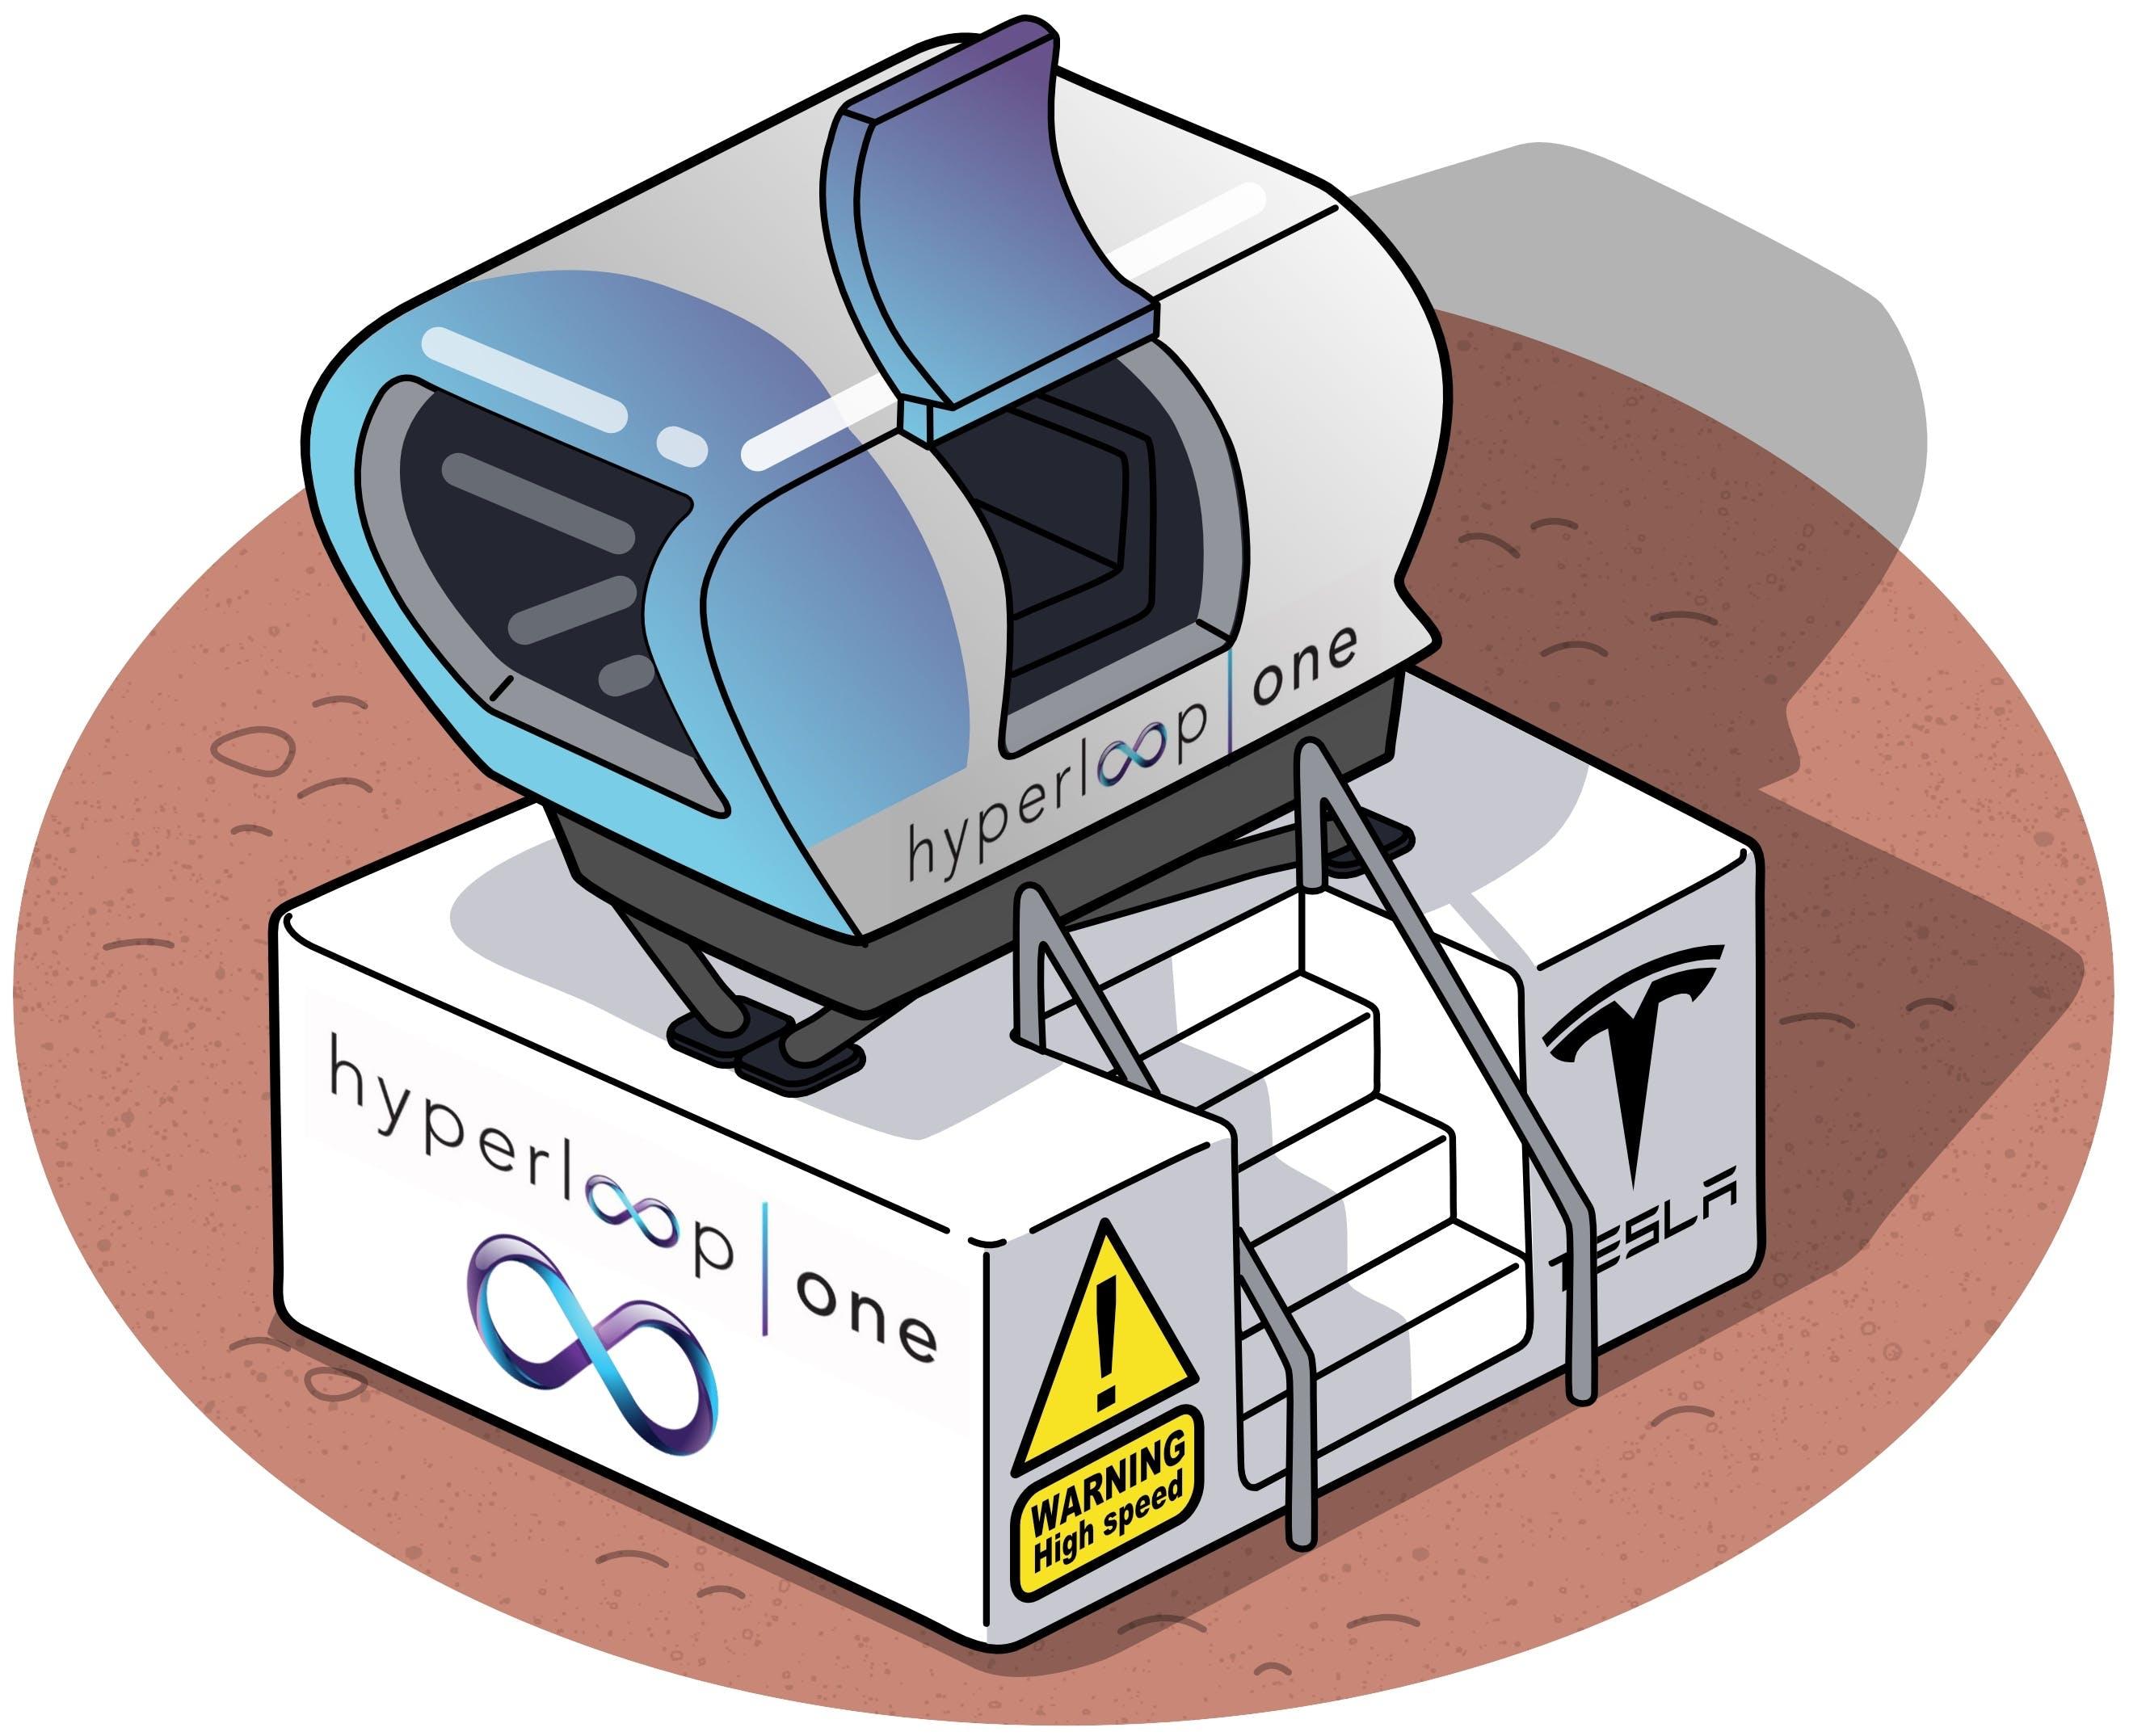 tesla hyperloop motion simulator